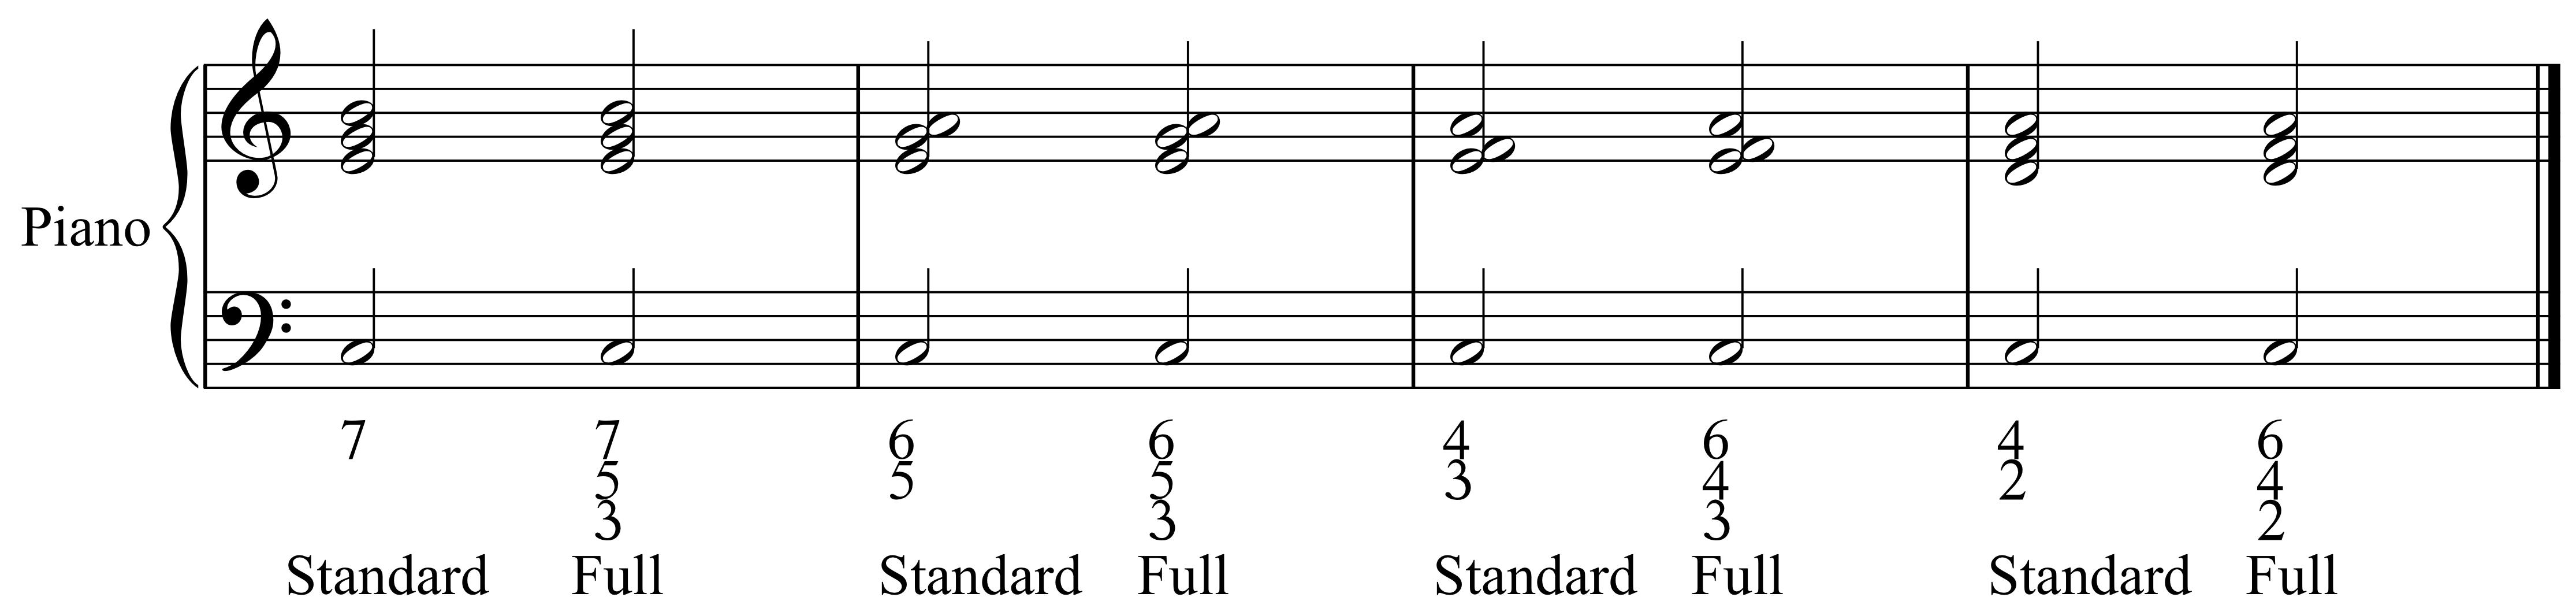 Lead sheet figured bass symbols view symbol buycottarizona